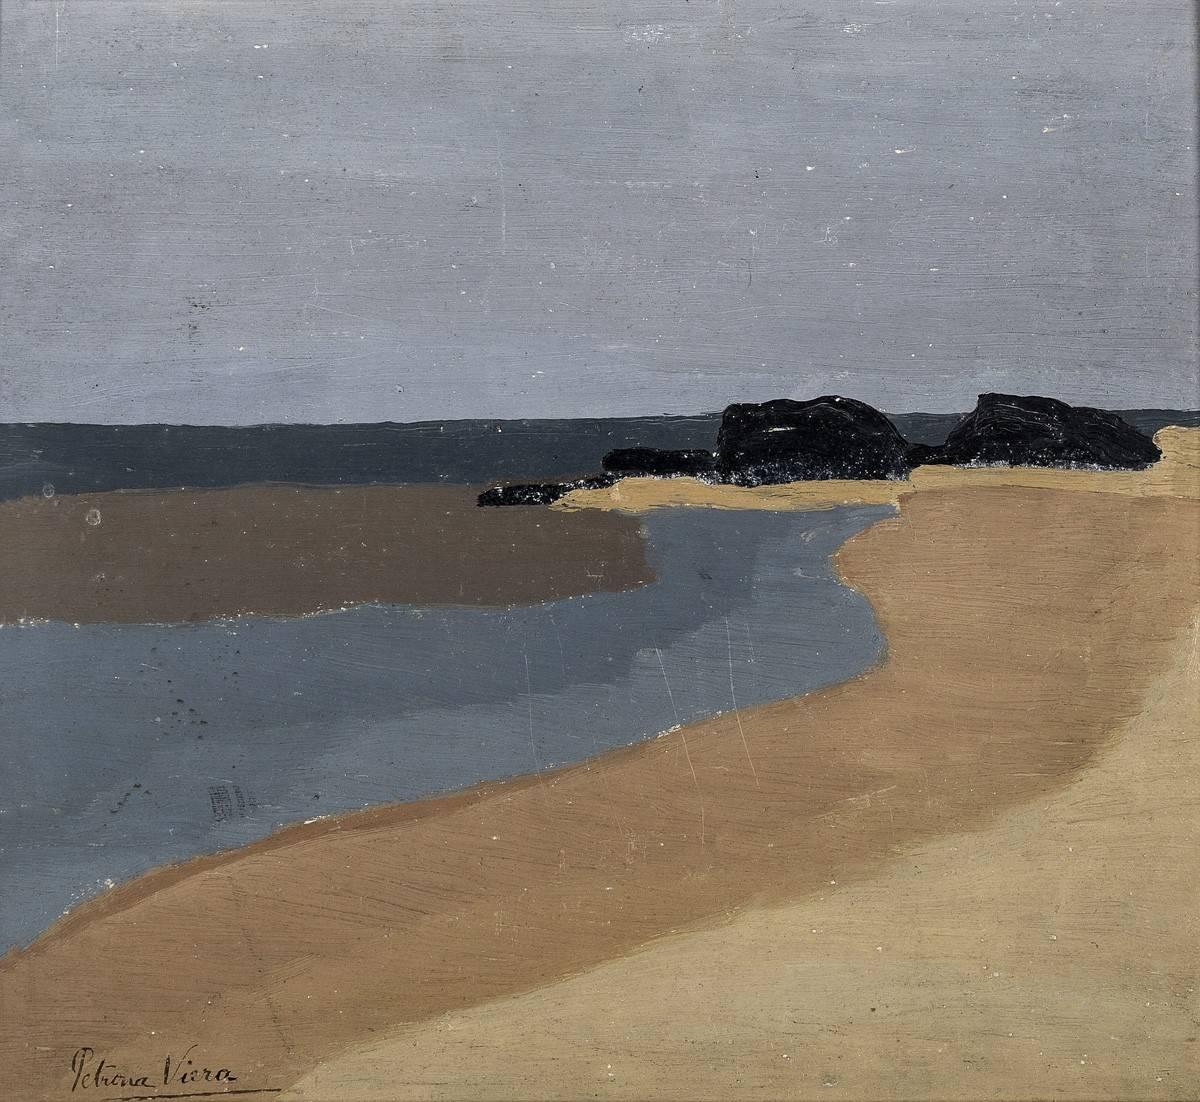 Obra ampliada: Playa Carrasco - Petrona Viera